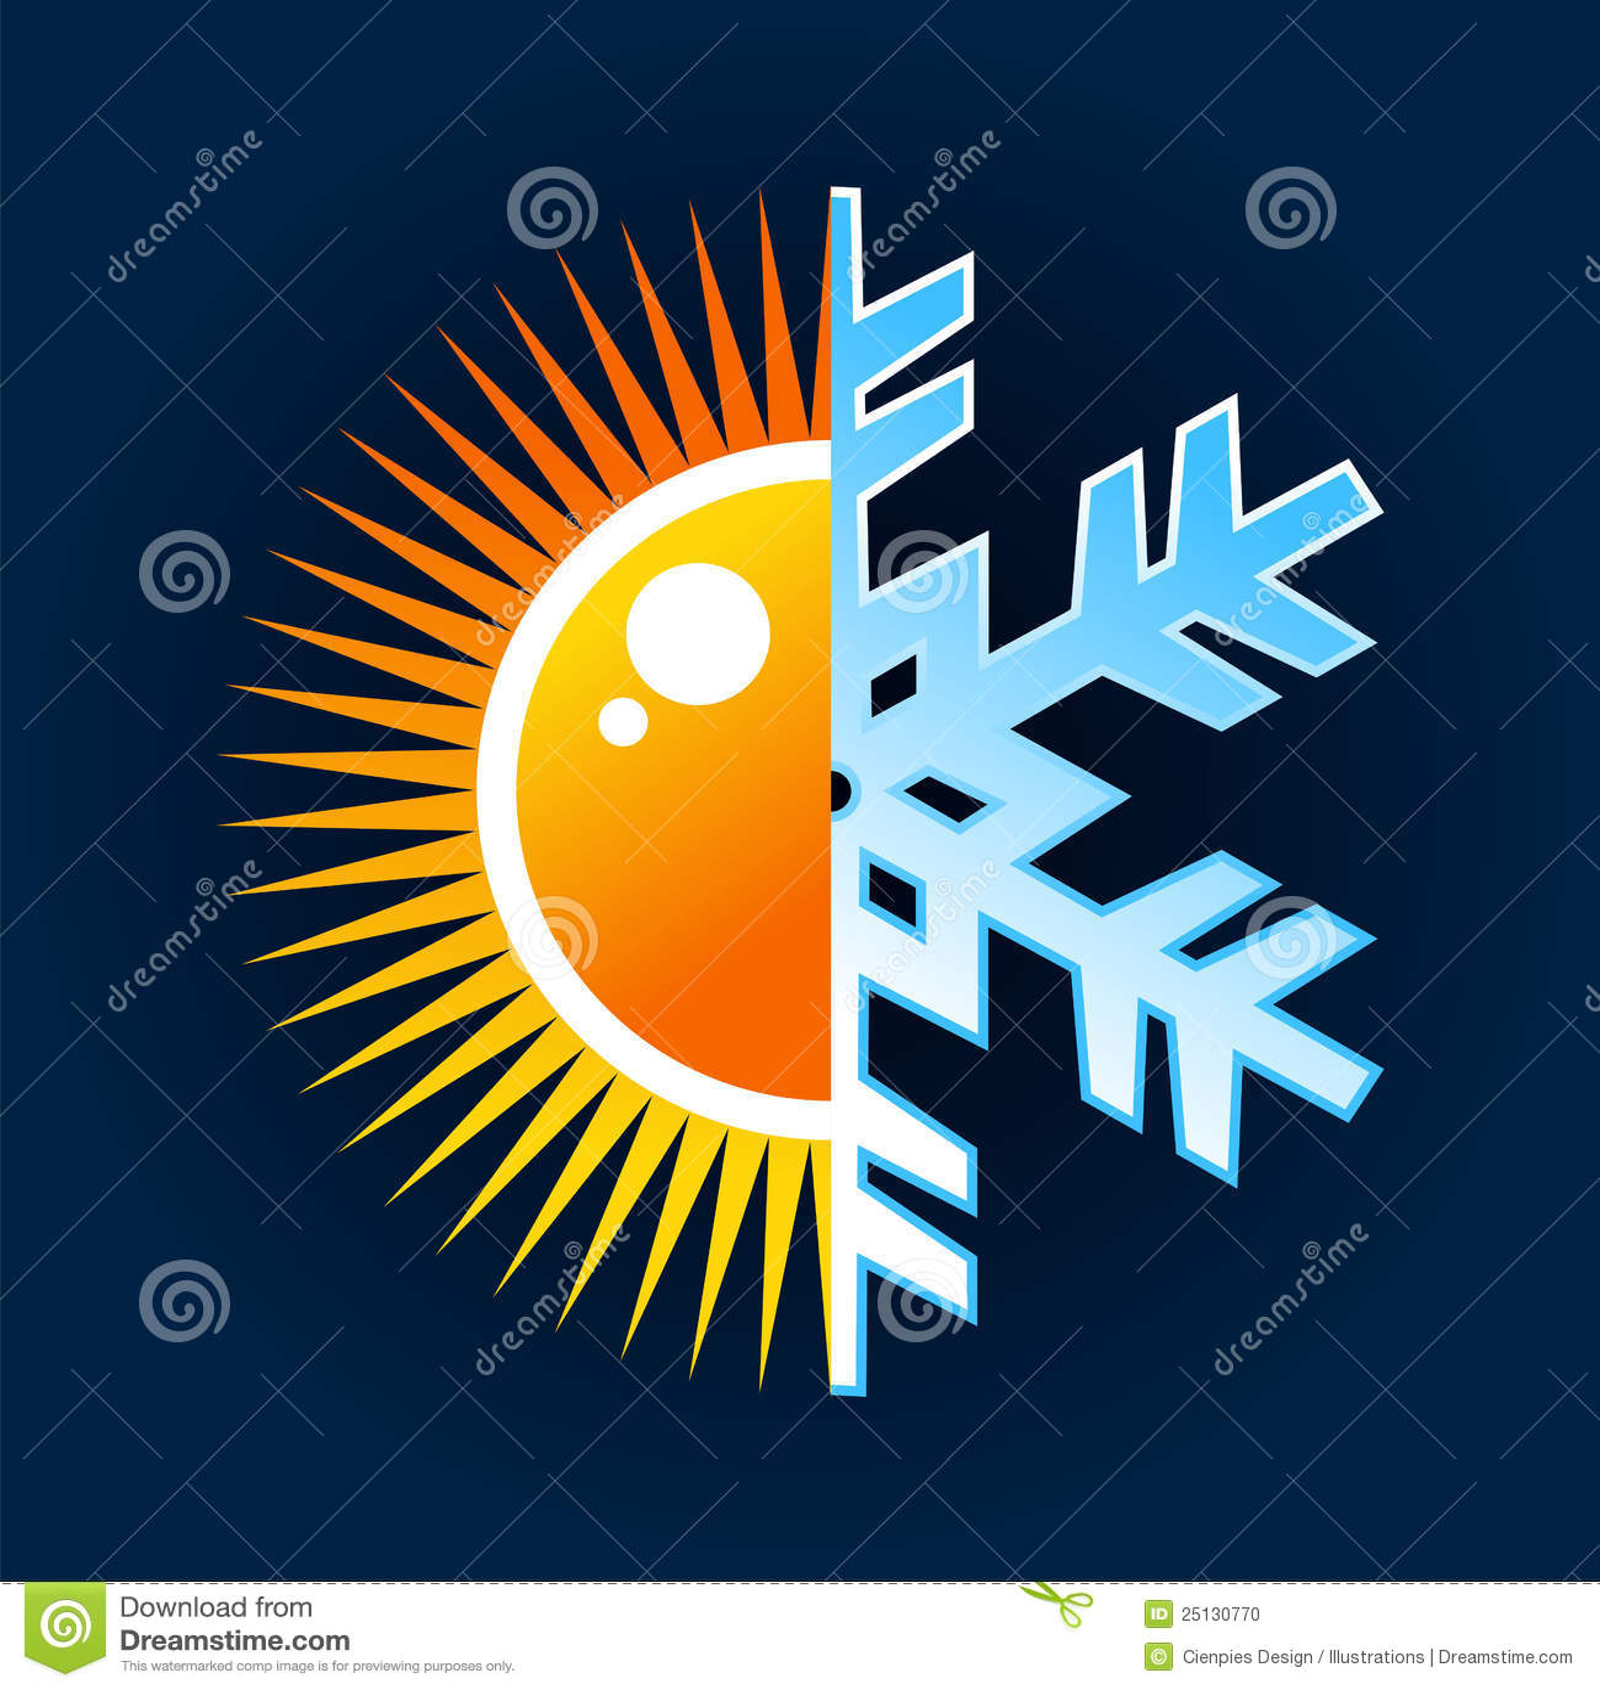 Hot And Cold Temperature Symbol Stock Vector